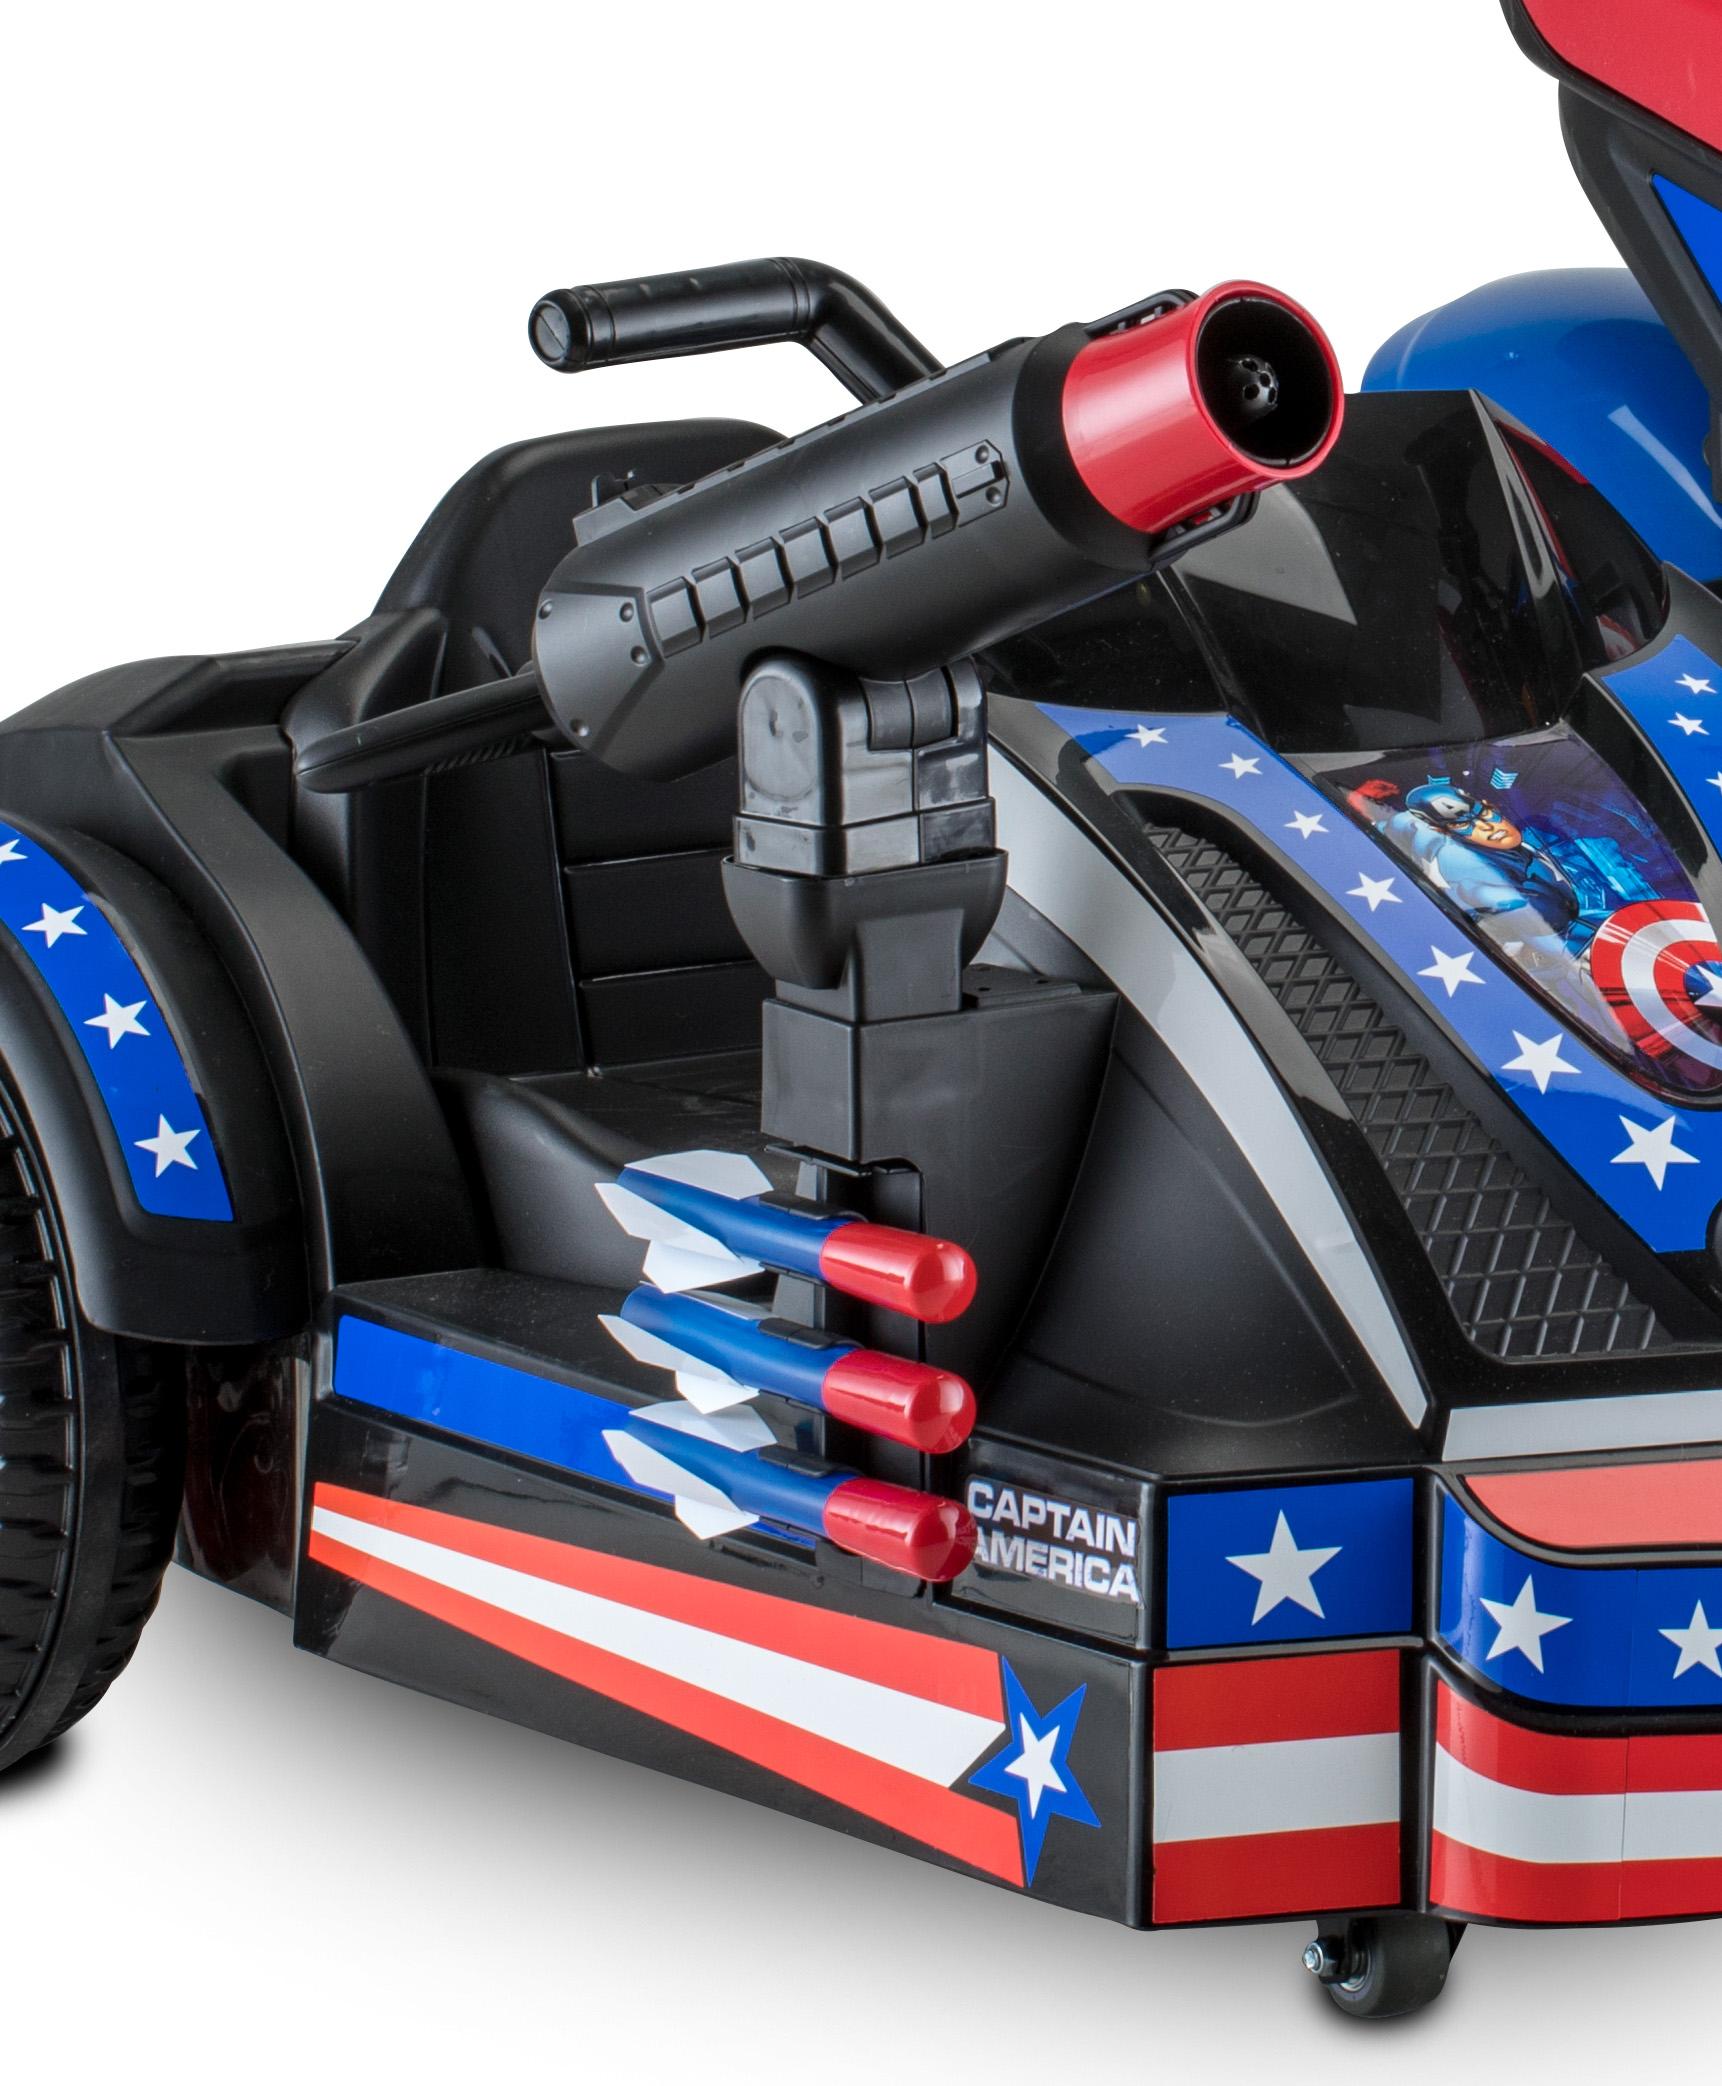 07df21a6c Kid Trax 12-Volt Captain America Motorcycle Ride-On - Walmart.com